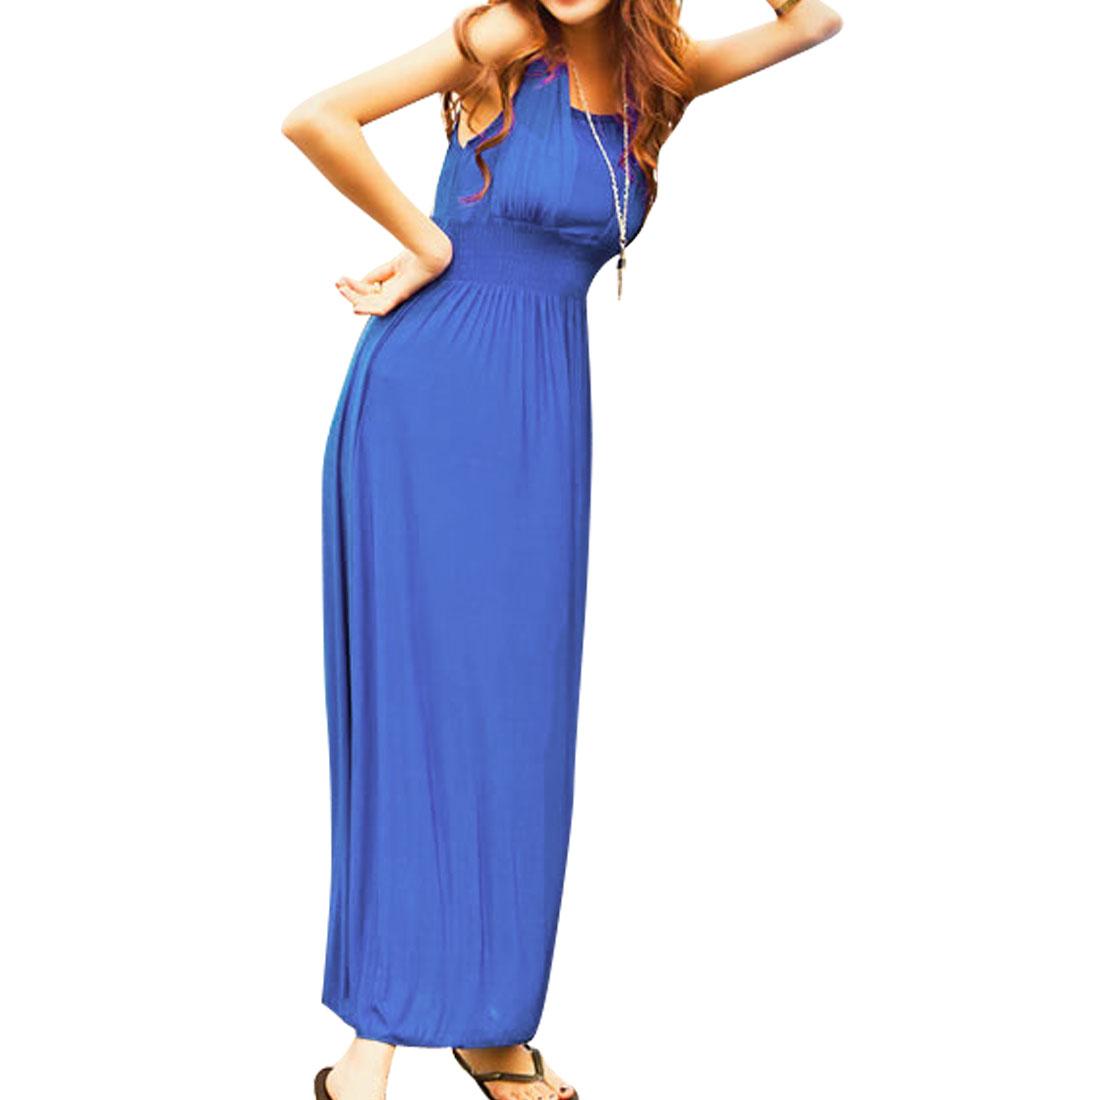 Ladies Sheath Waist Ruffled Sleeveless Maxi Halter Dress Blue XS